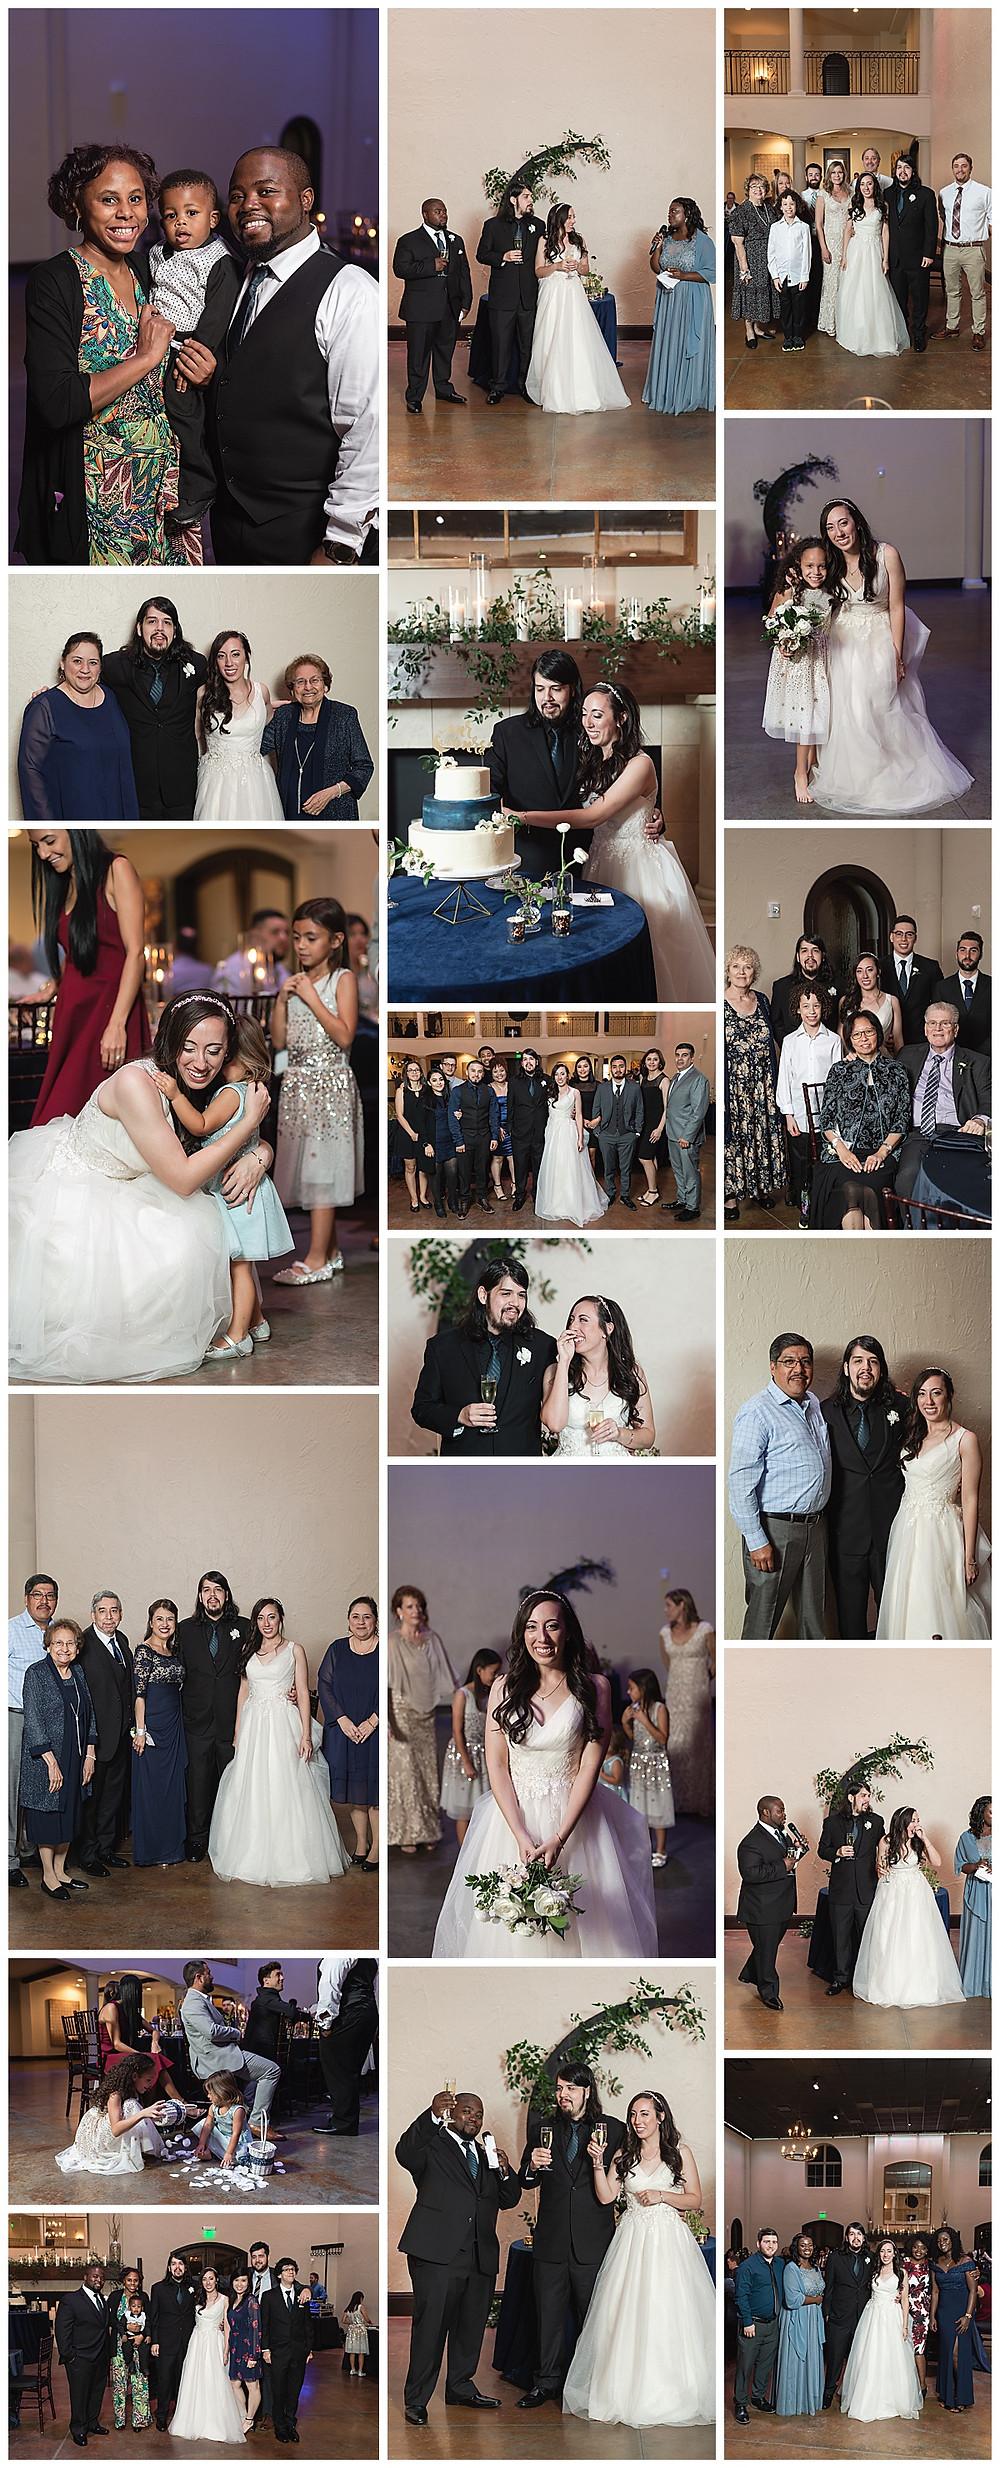 Chapel Ana Villa, The colony Texas, dallas wedding, dallas wedding photography, dallas wedding venue , brunch wedding food, wedding toasts, wedding reception